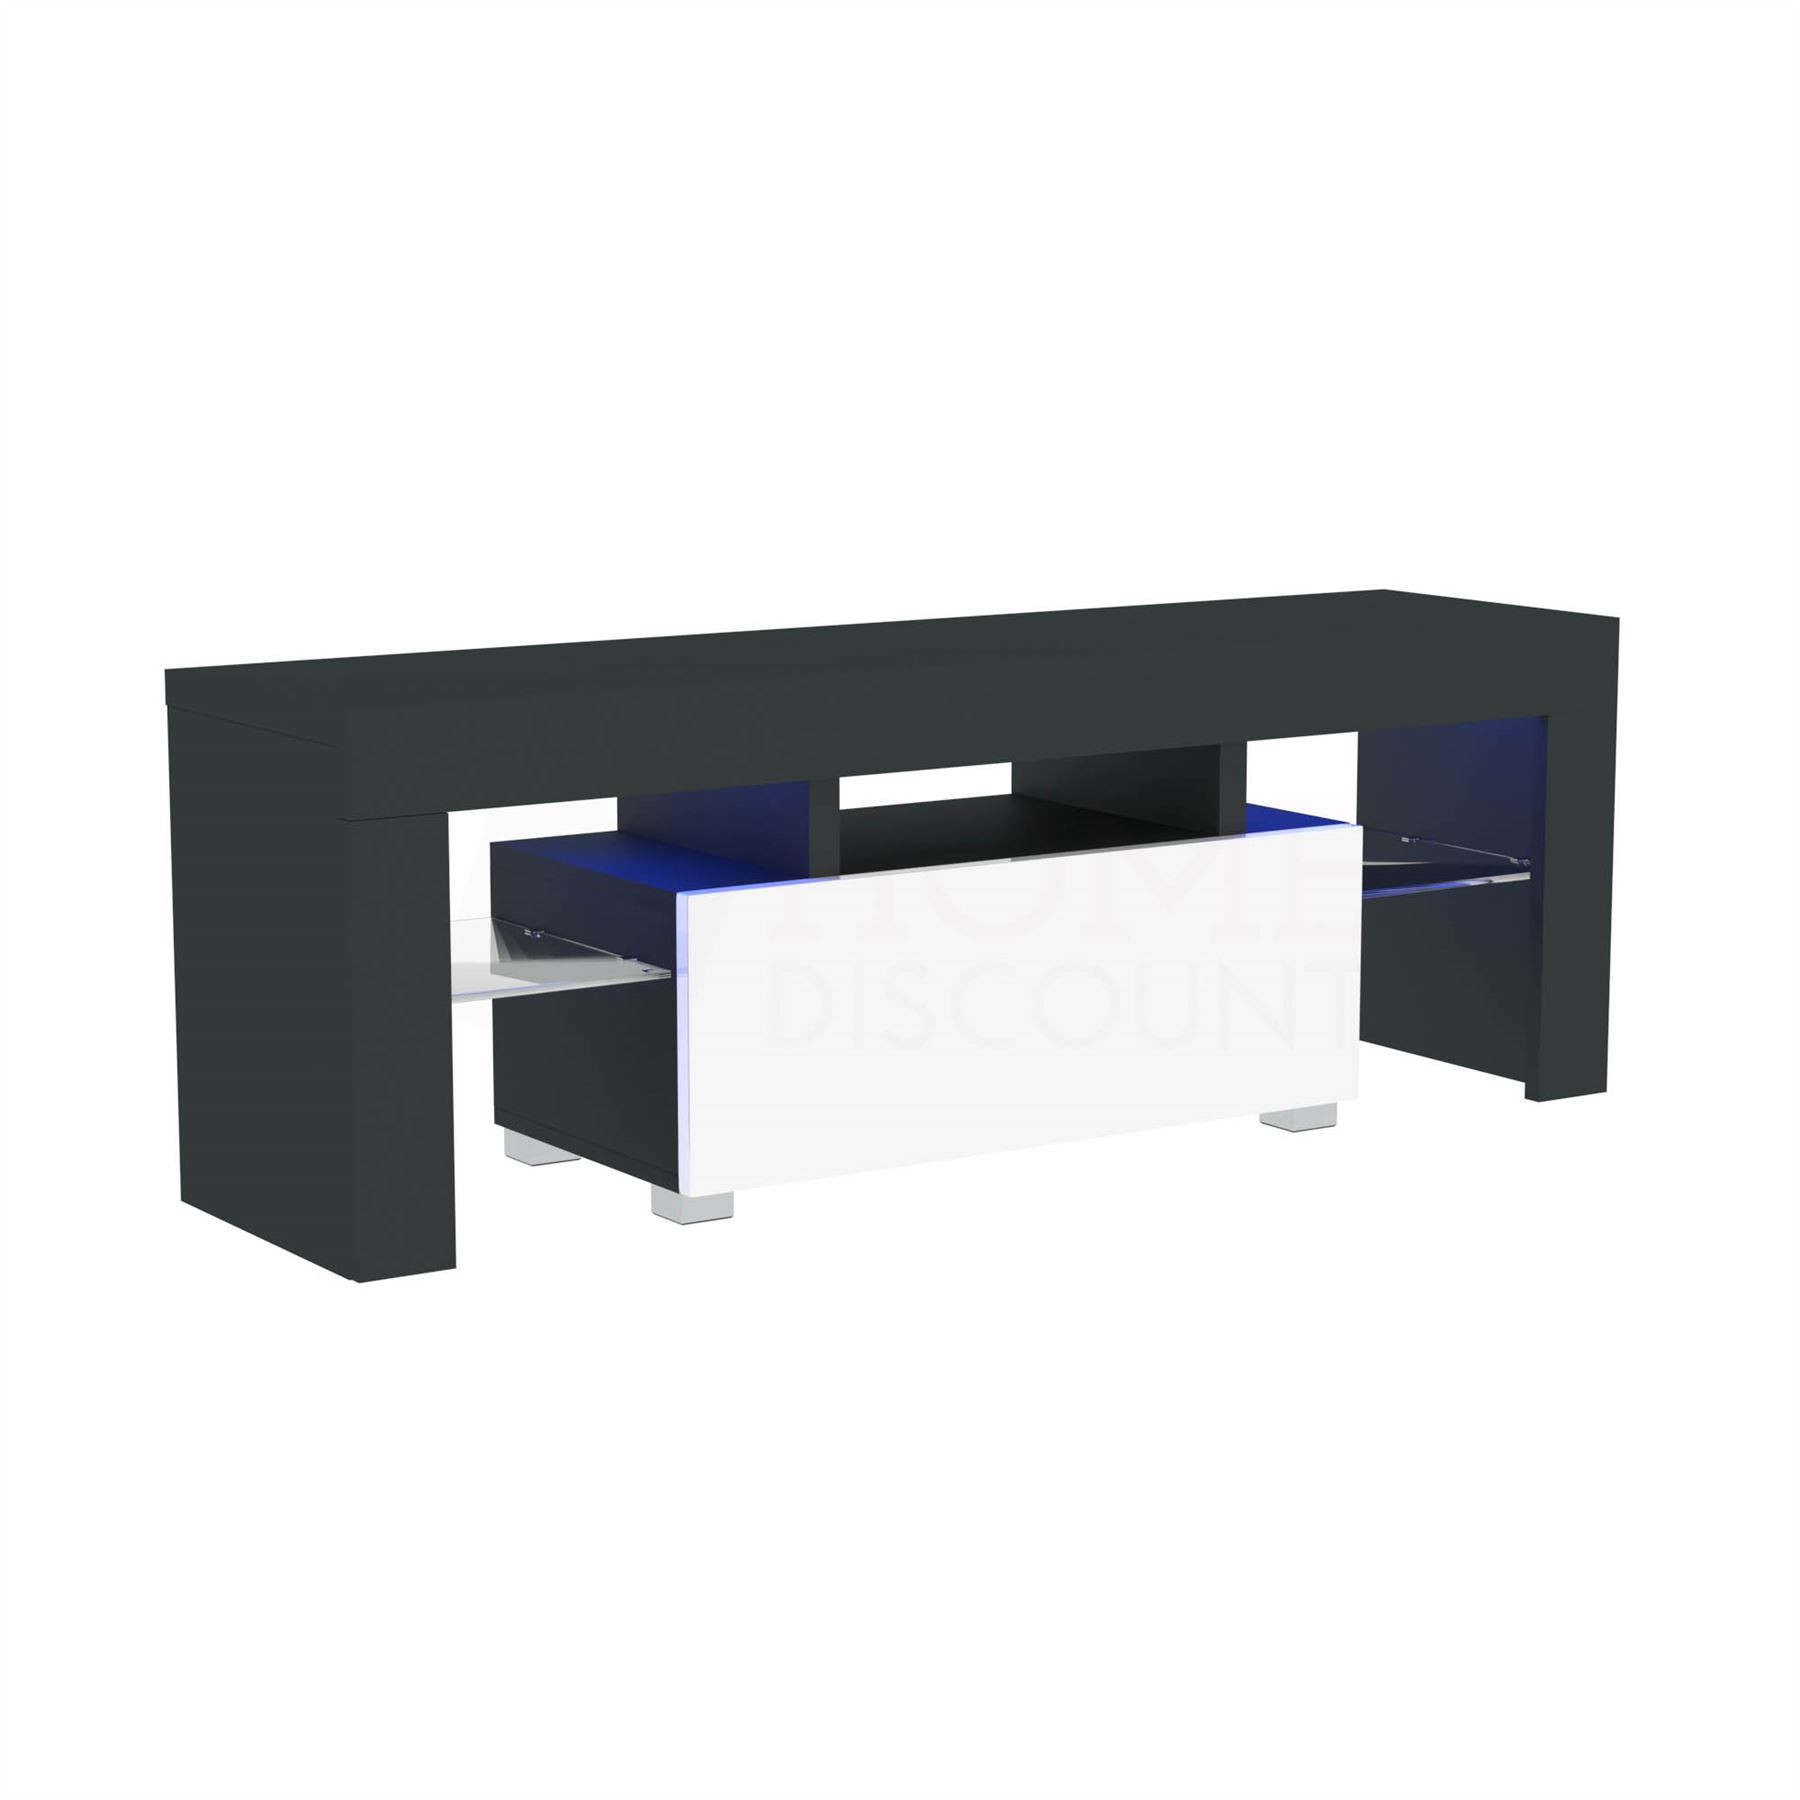 thumbnail 47 - LED TV Unit Modern White Black Walnut Stand 2 Drawer 2 Door Light System RGB MDF